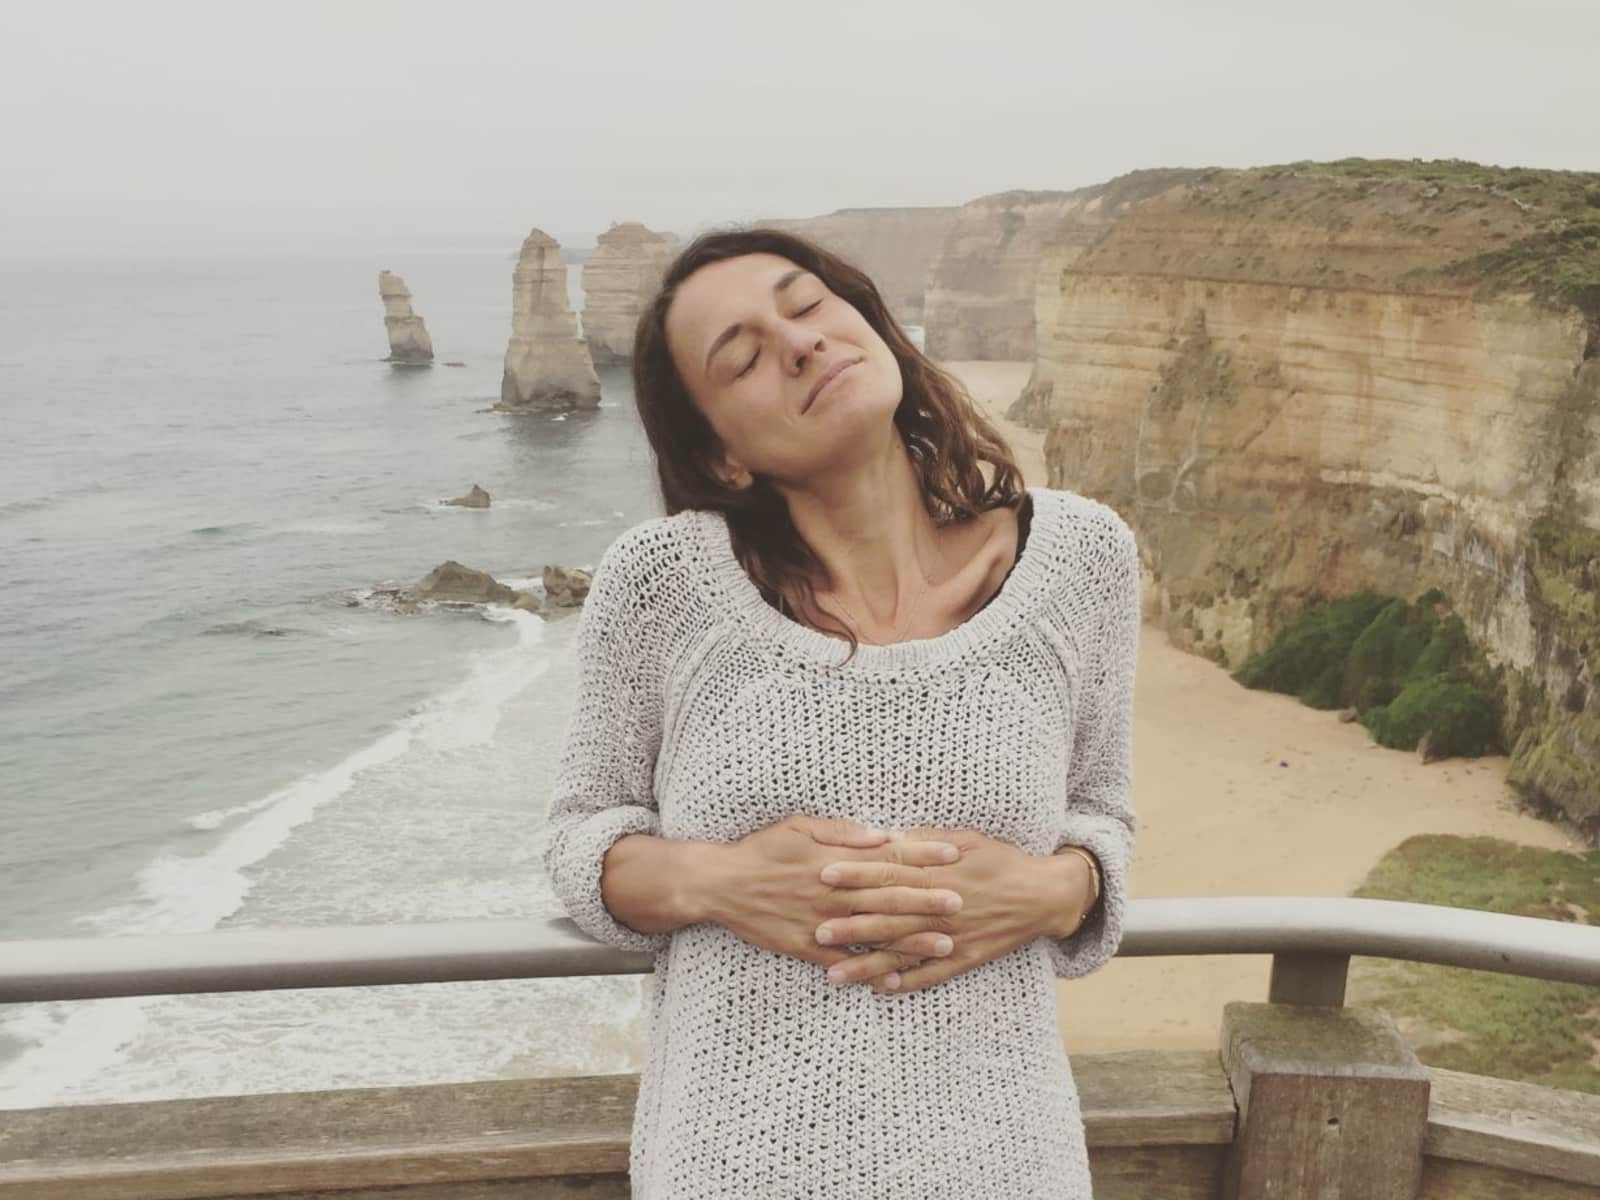 Rachel from Melbourne, Victoria, Australia